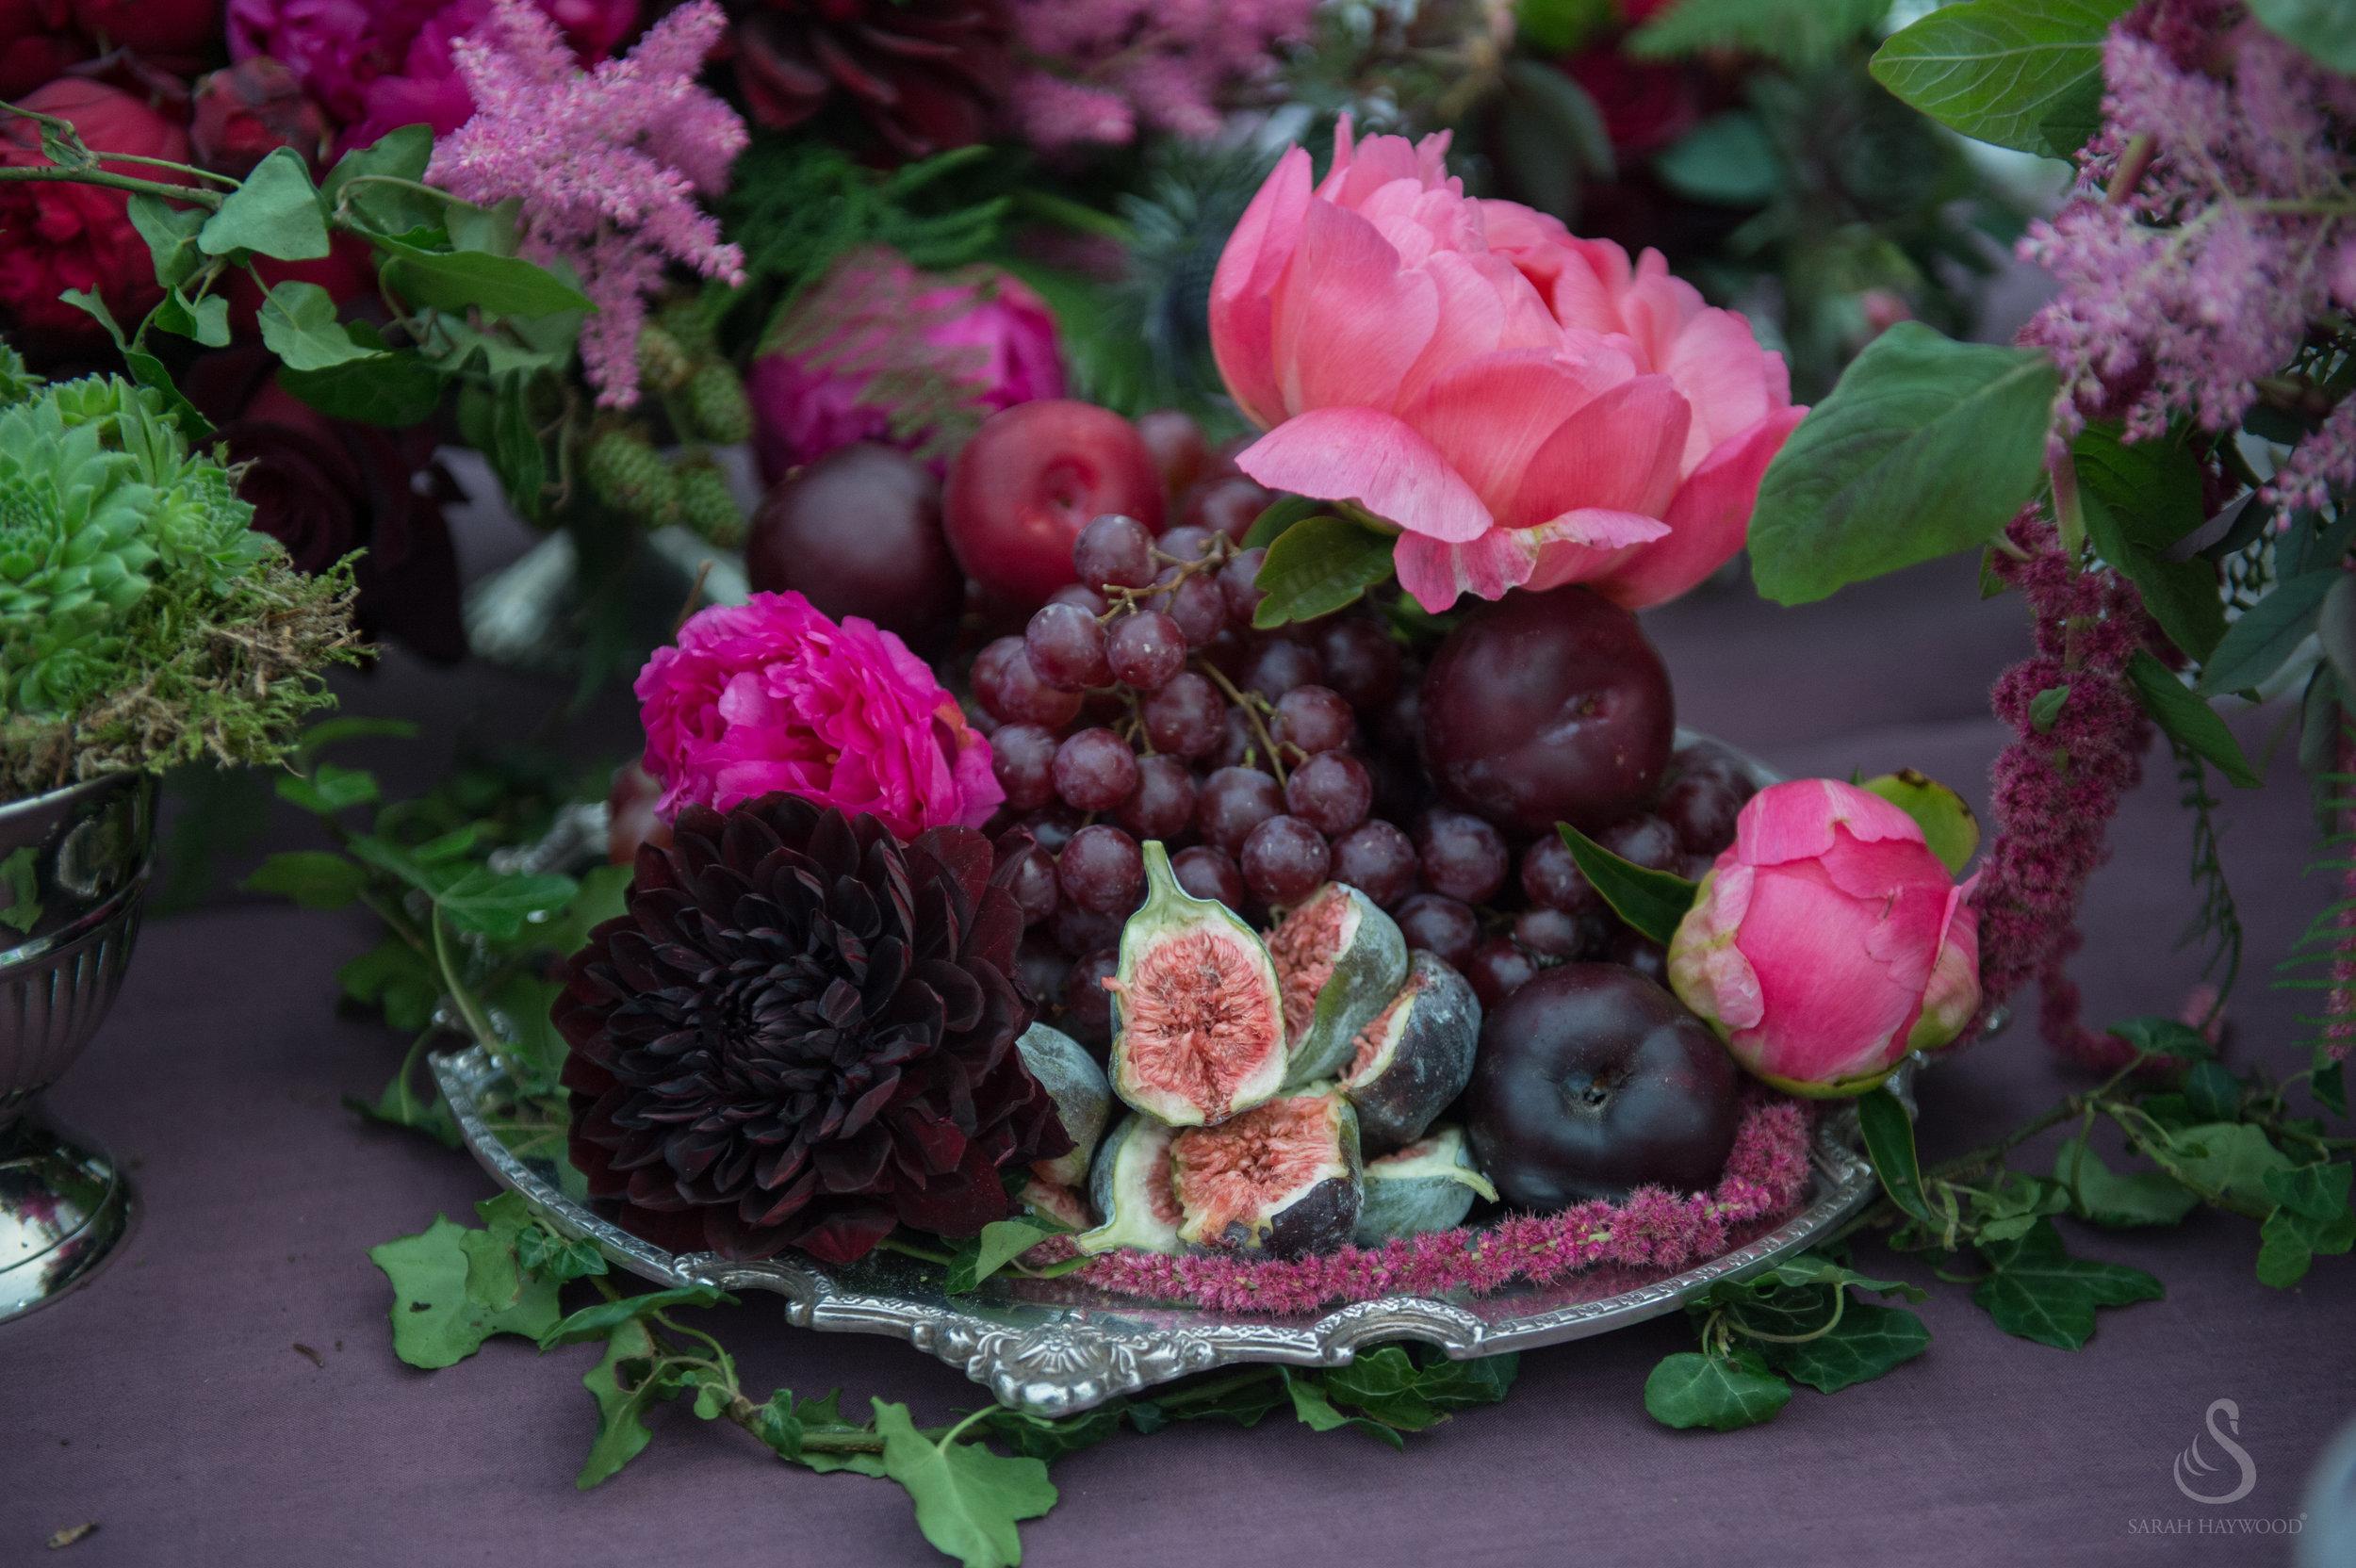 Scotland_Wedding_copyright_Carla Ten Eyck_for Sarah Haywood Wedding Design_805 copy.jpg